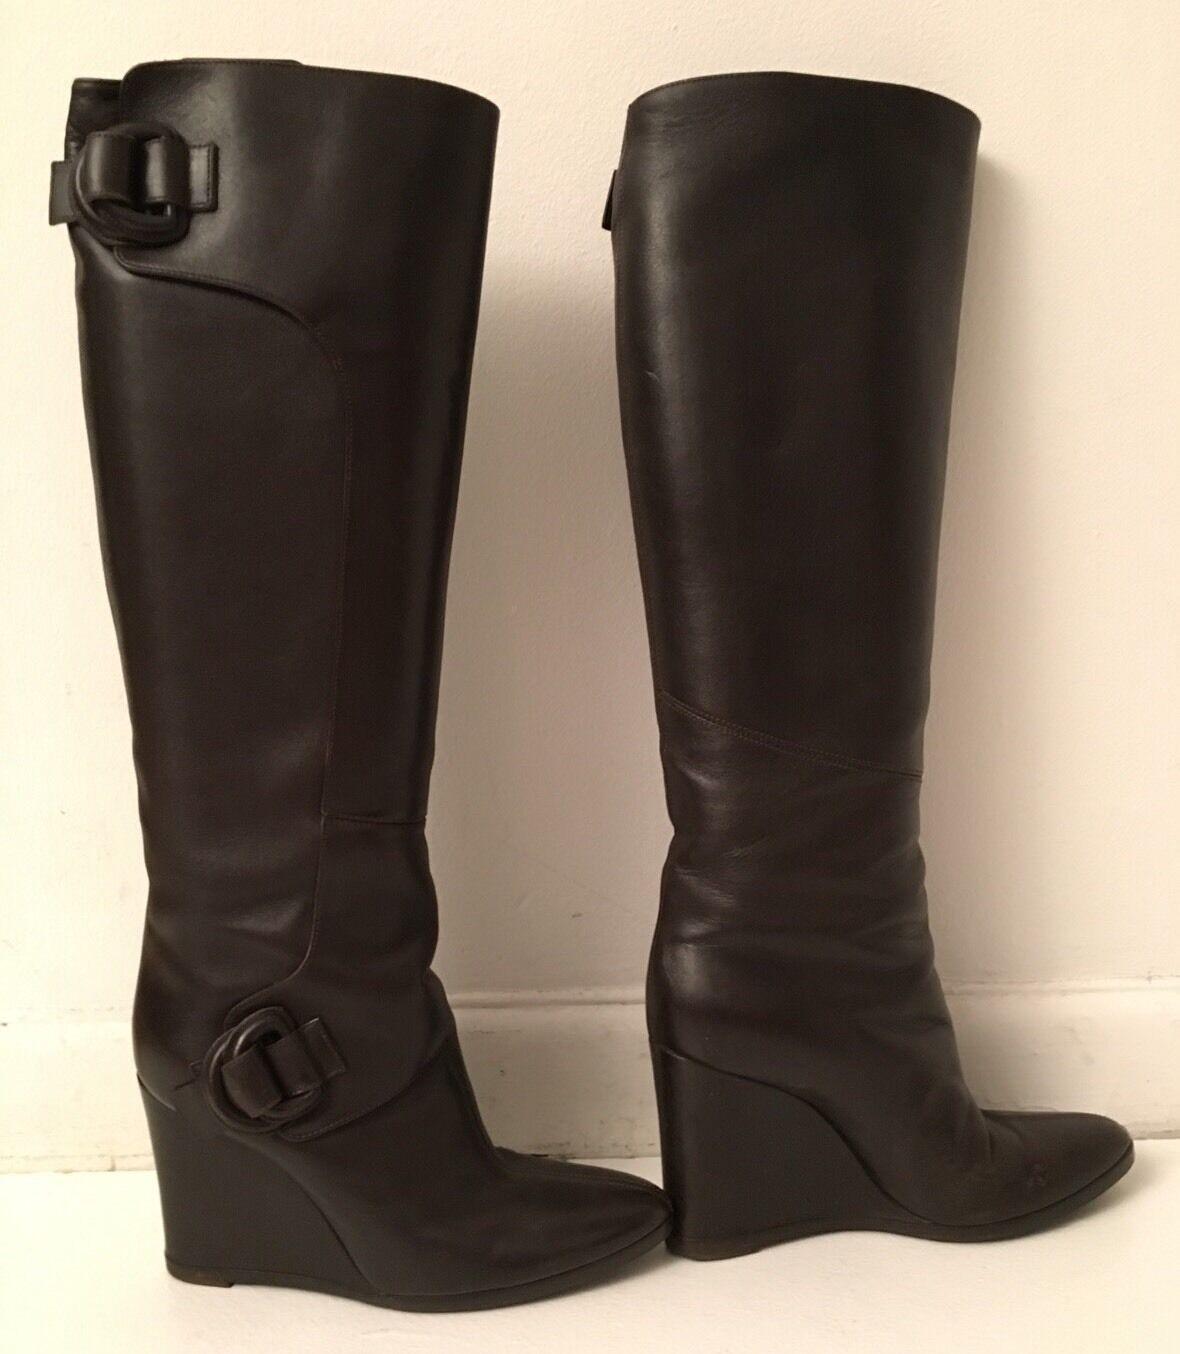 Balenciaga en en en cuir marron talon compensé genou-Bottes hautes SZ UE 38.5 US 8.5 M 3da4c4